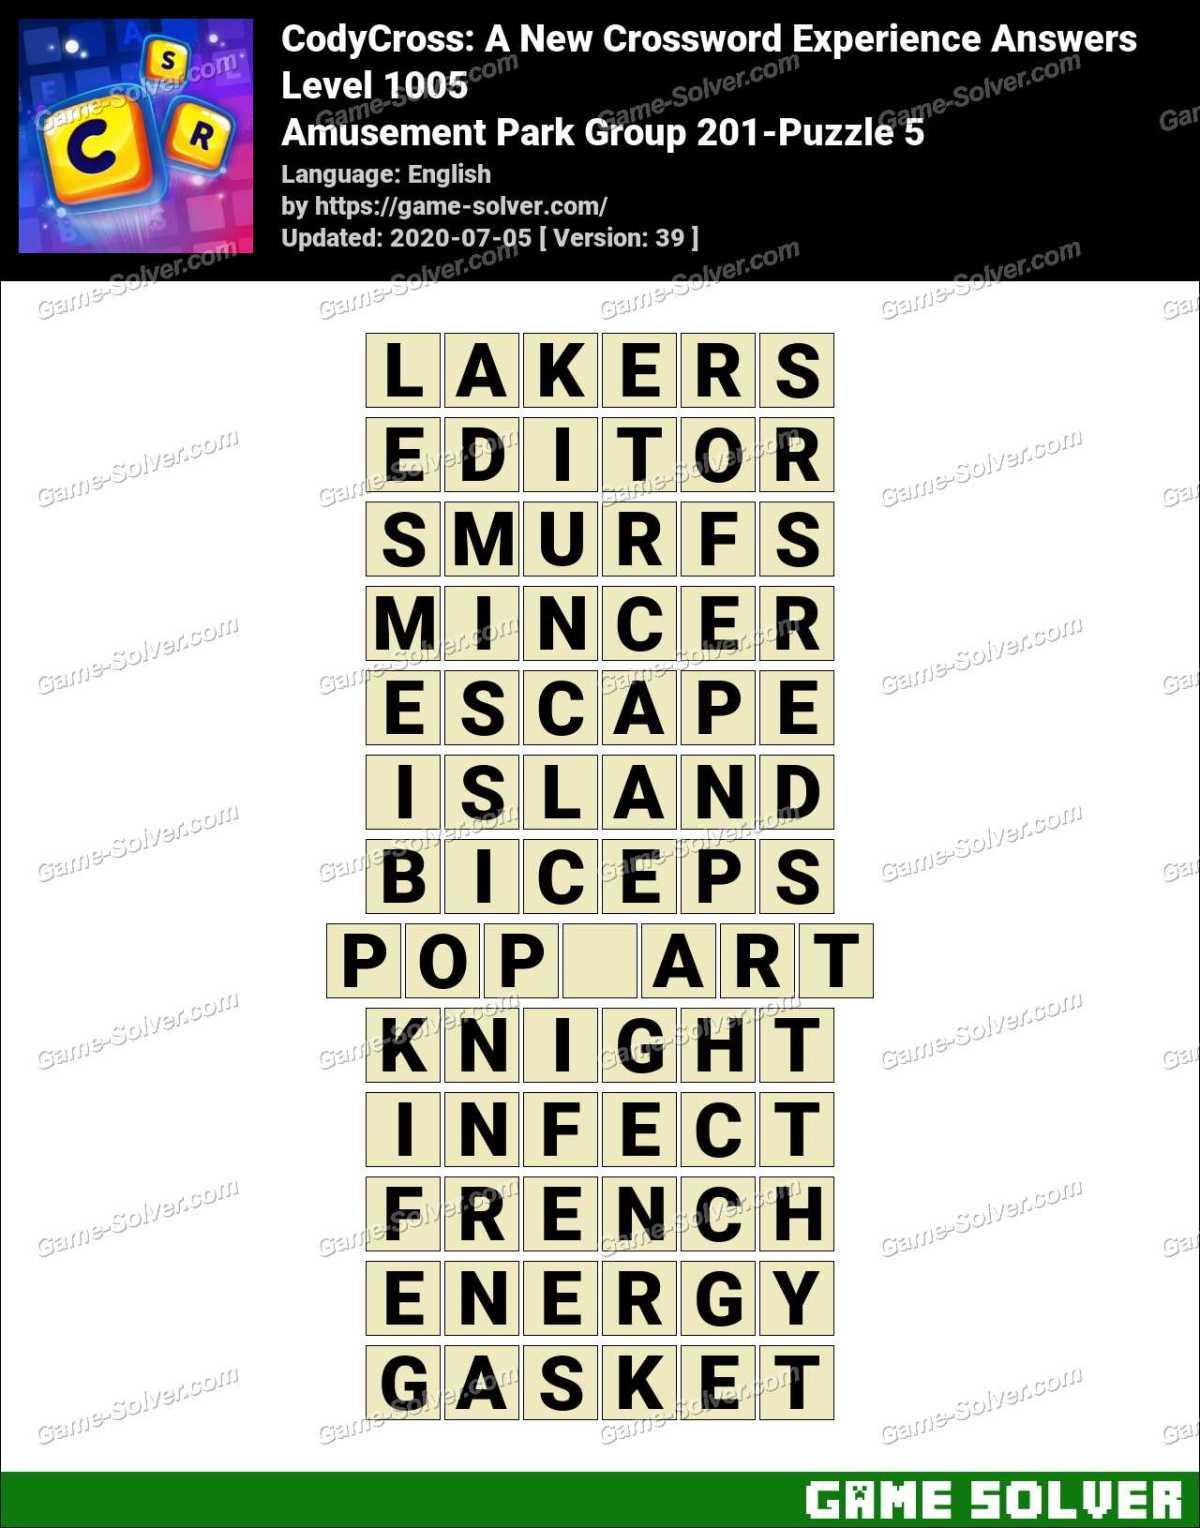 CodyCross Amusement Park Group 201-Puzzle 5 Answers